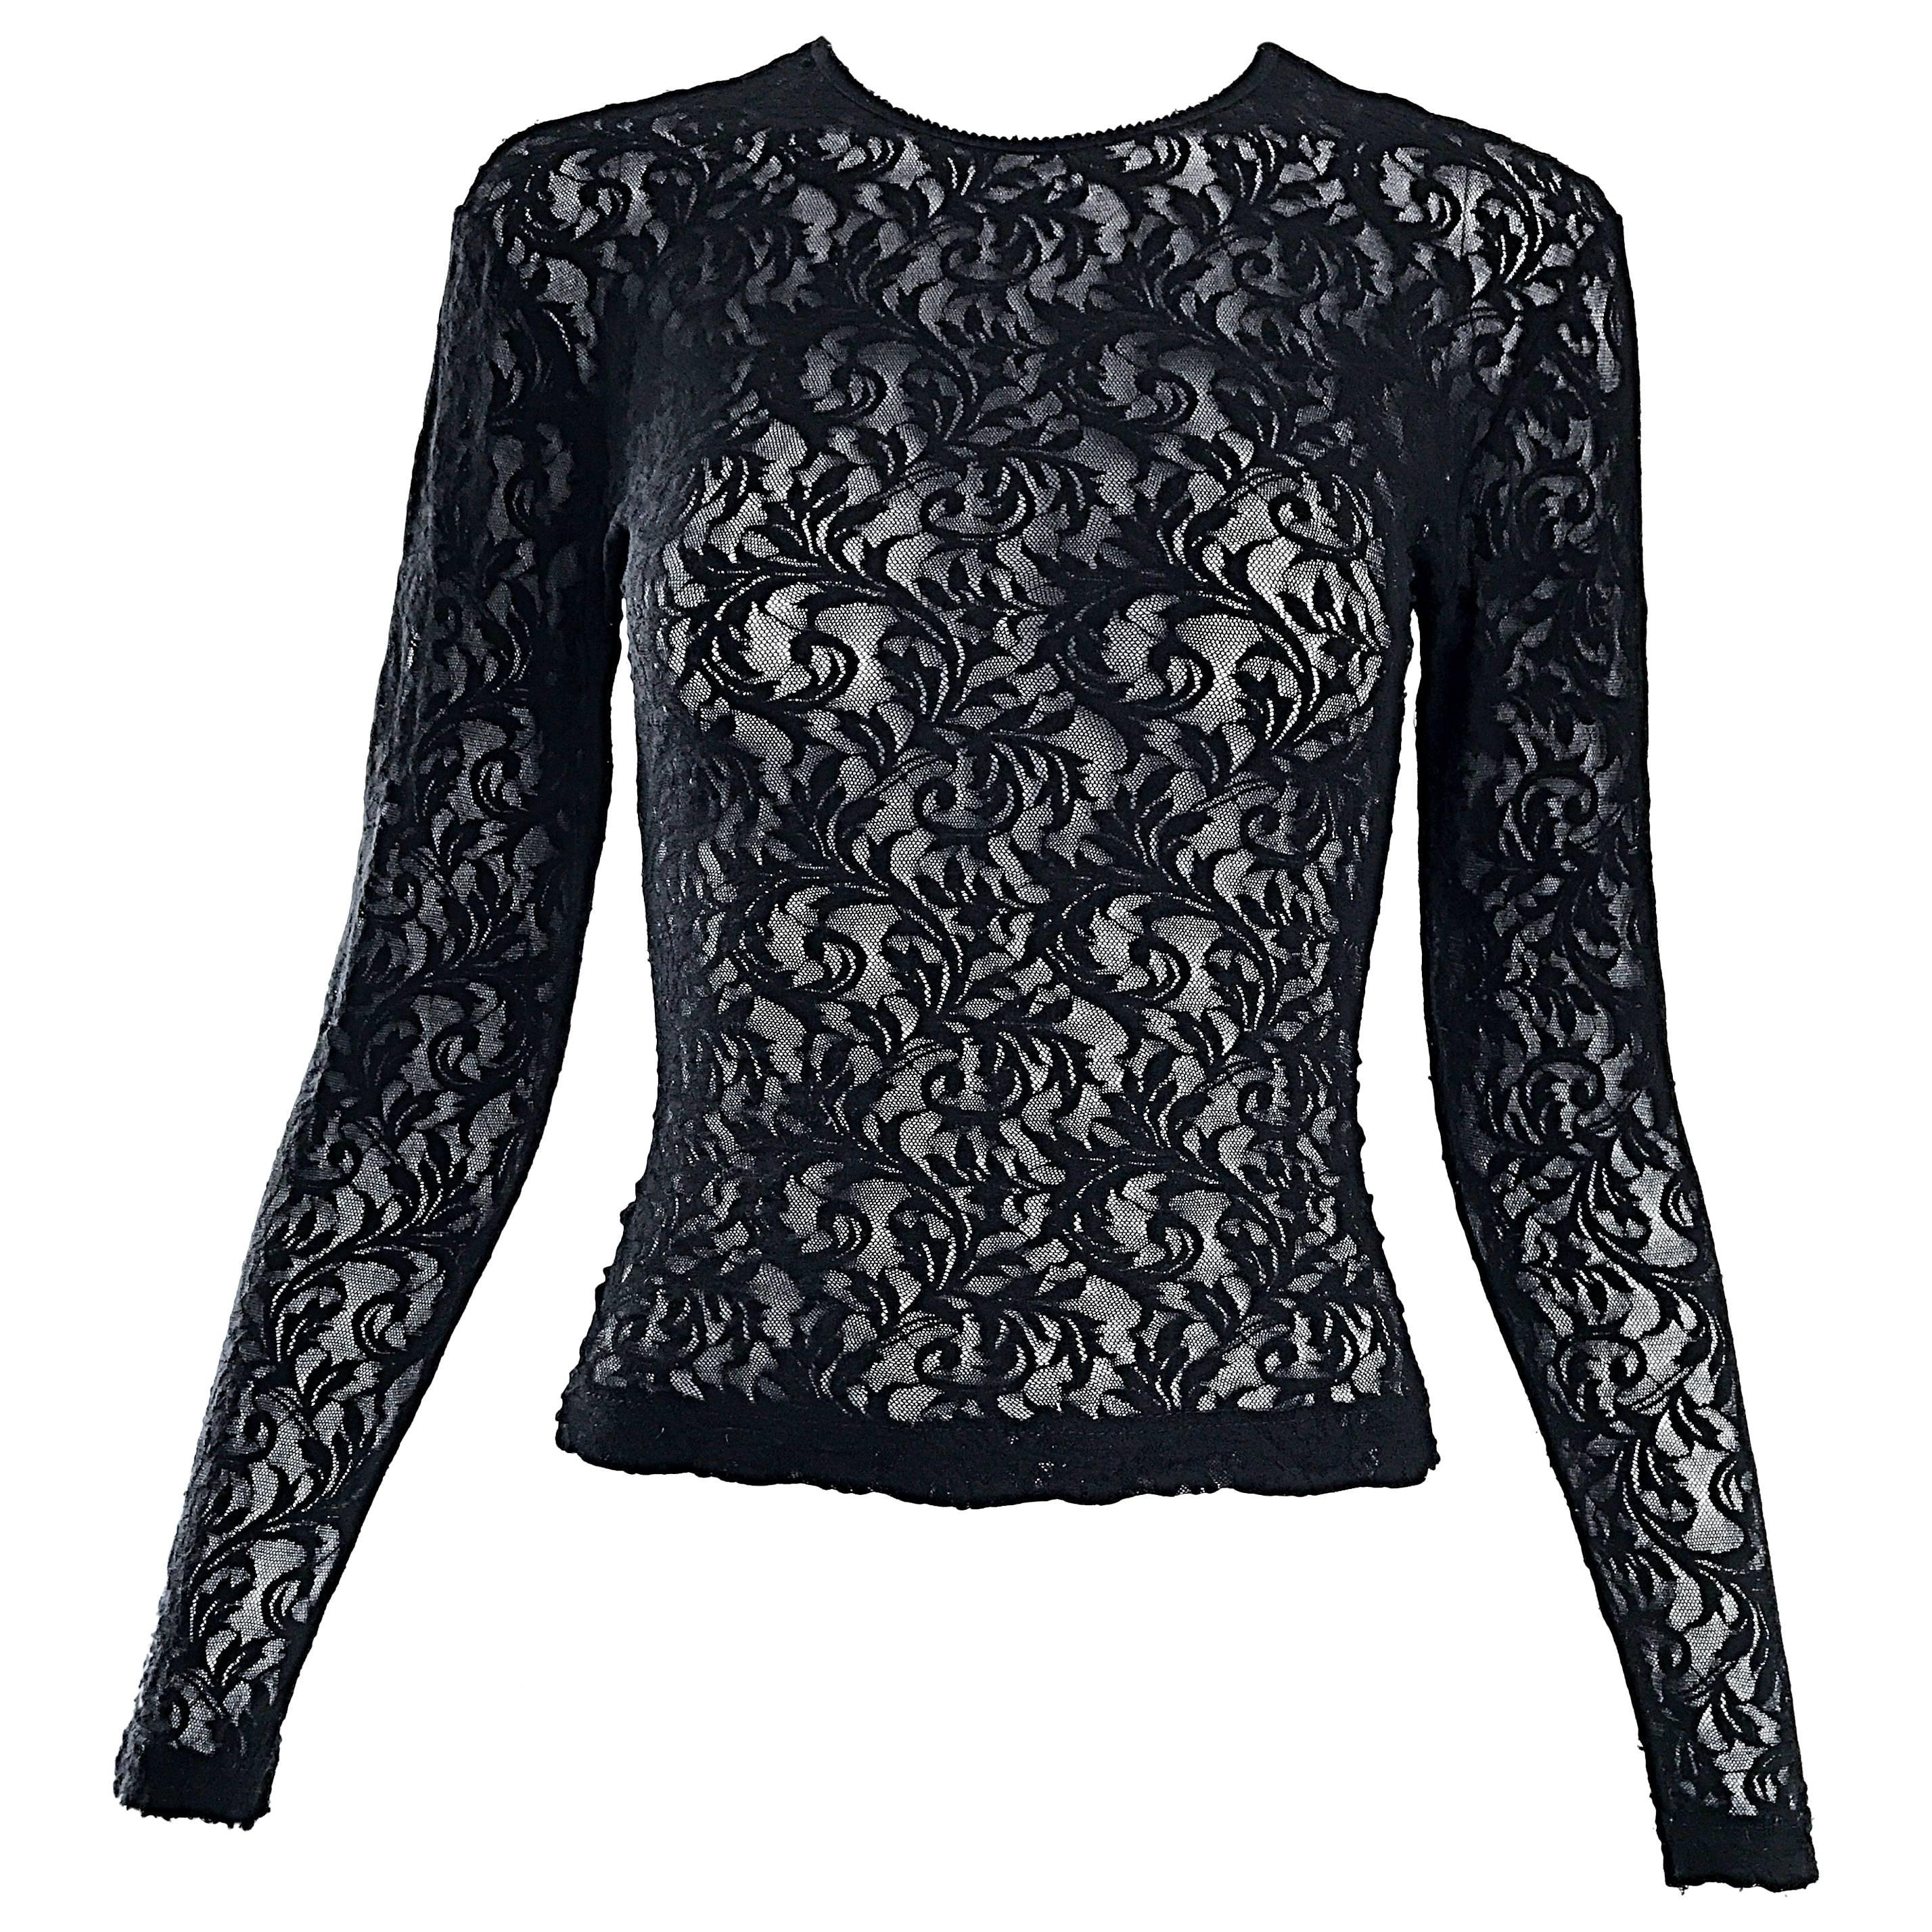 1990s Calvin Klein Black Lace Vintage Bodycon Sexy Sheer 90s Crop Top Blouse